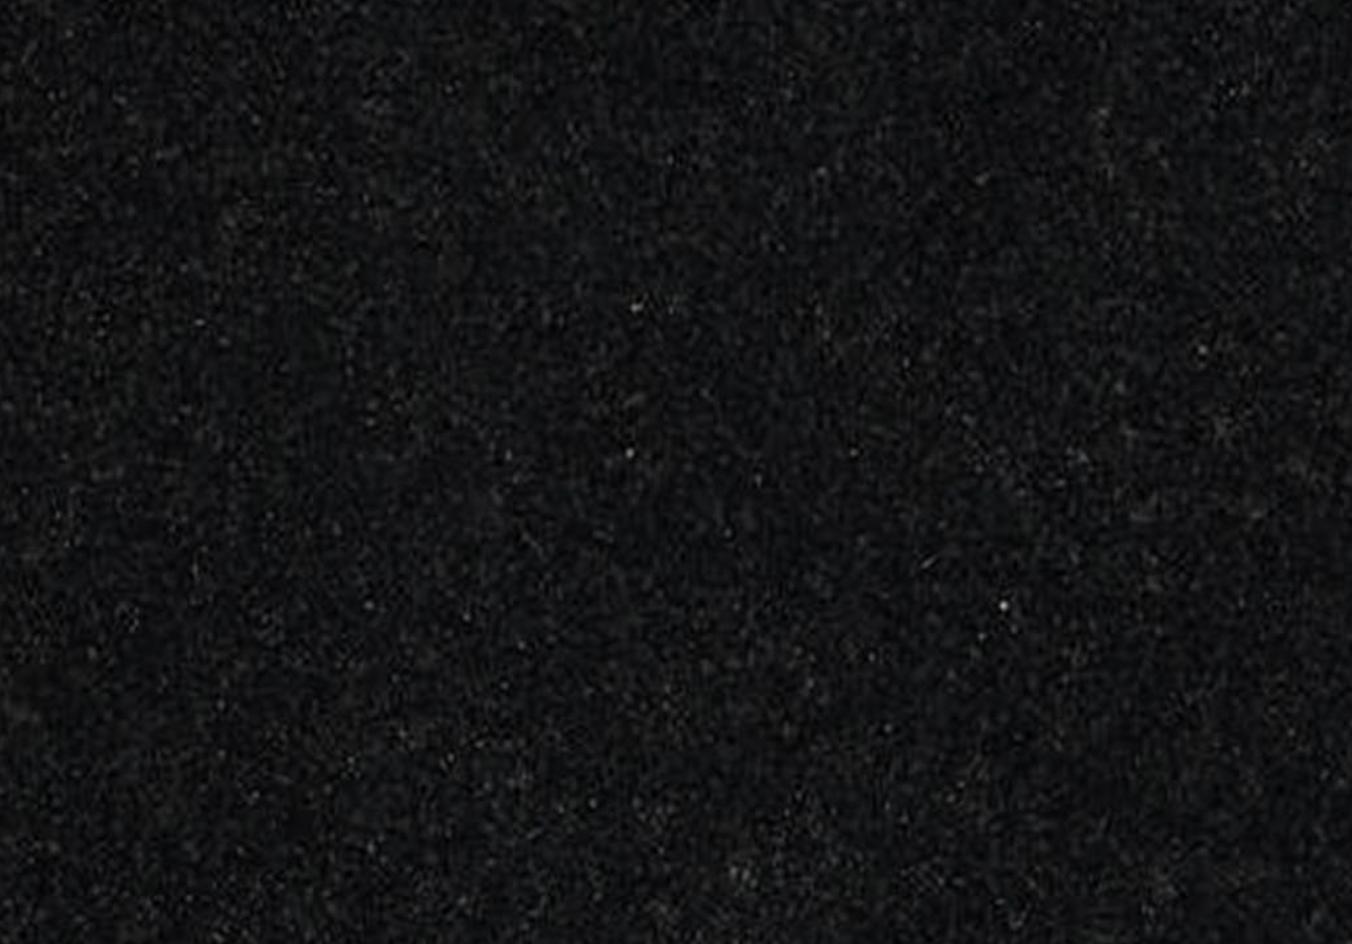 Noir Absolu | Nero Assoluto